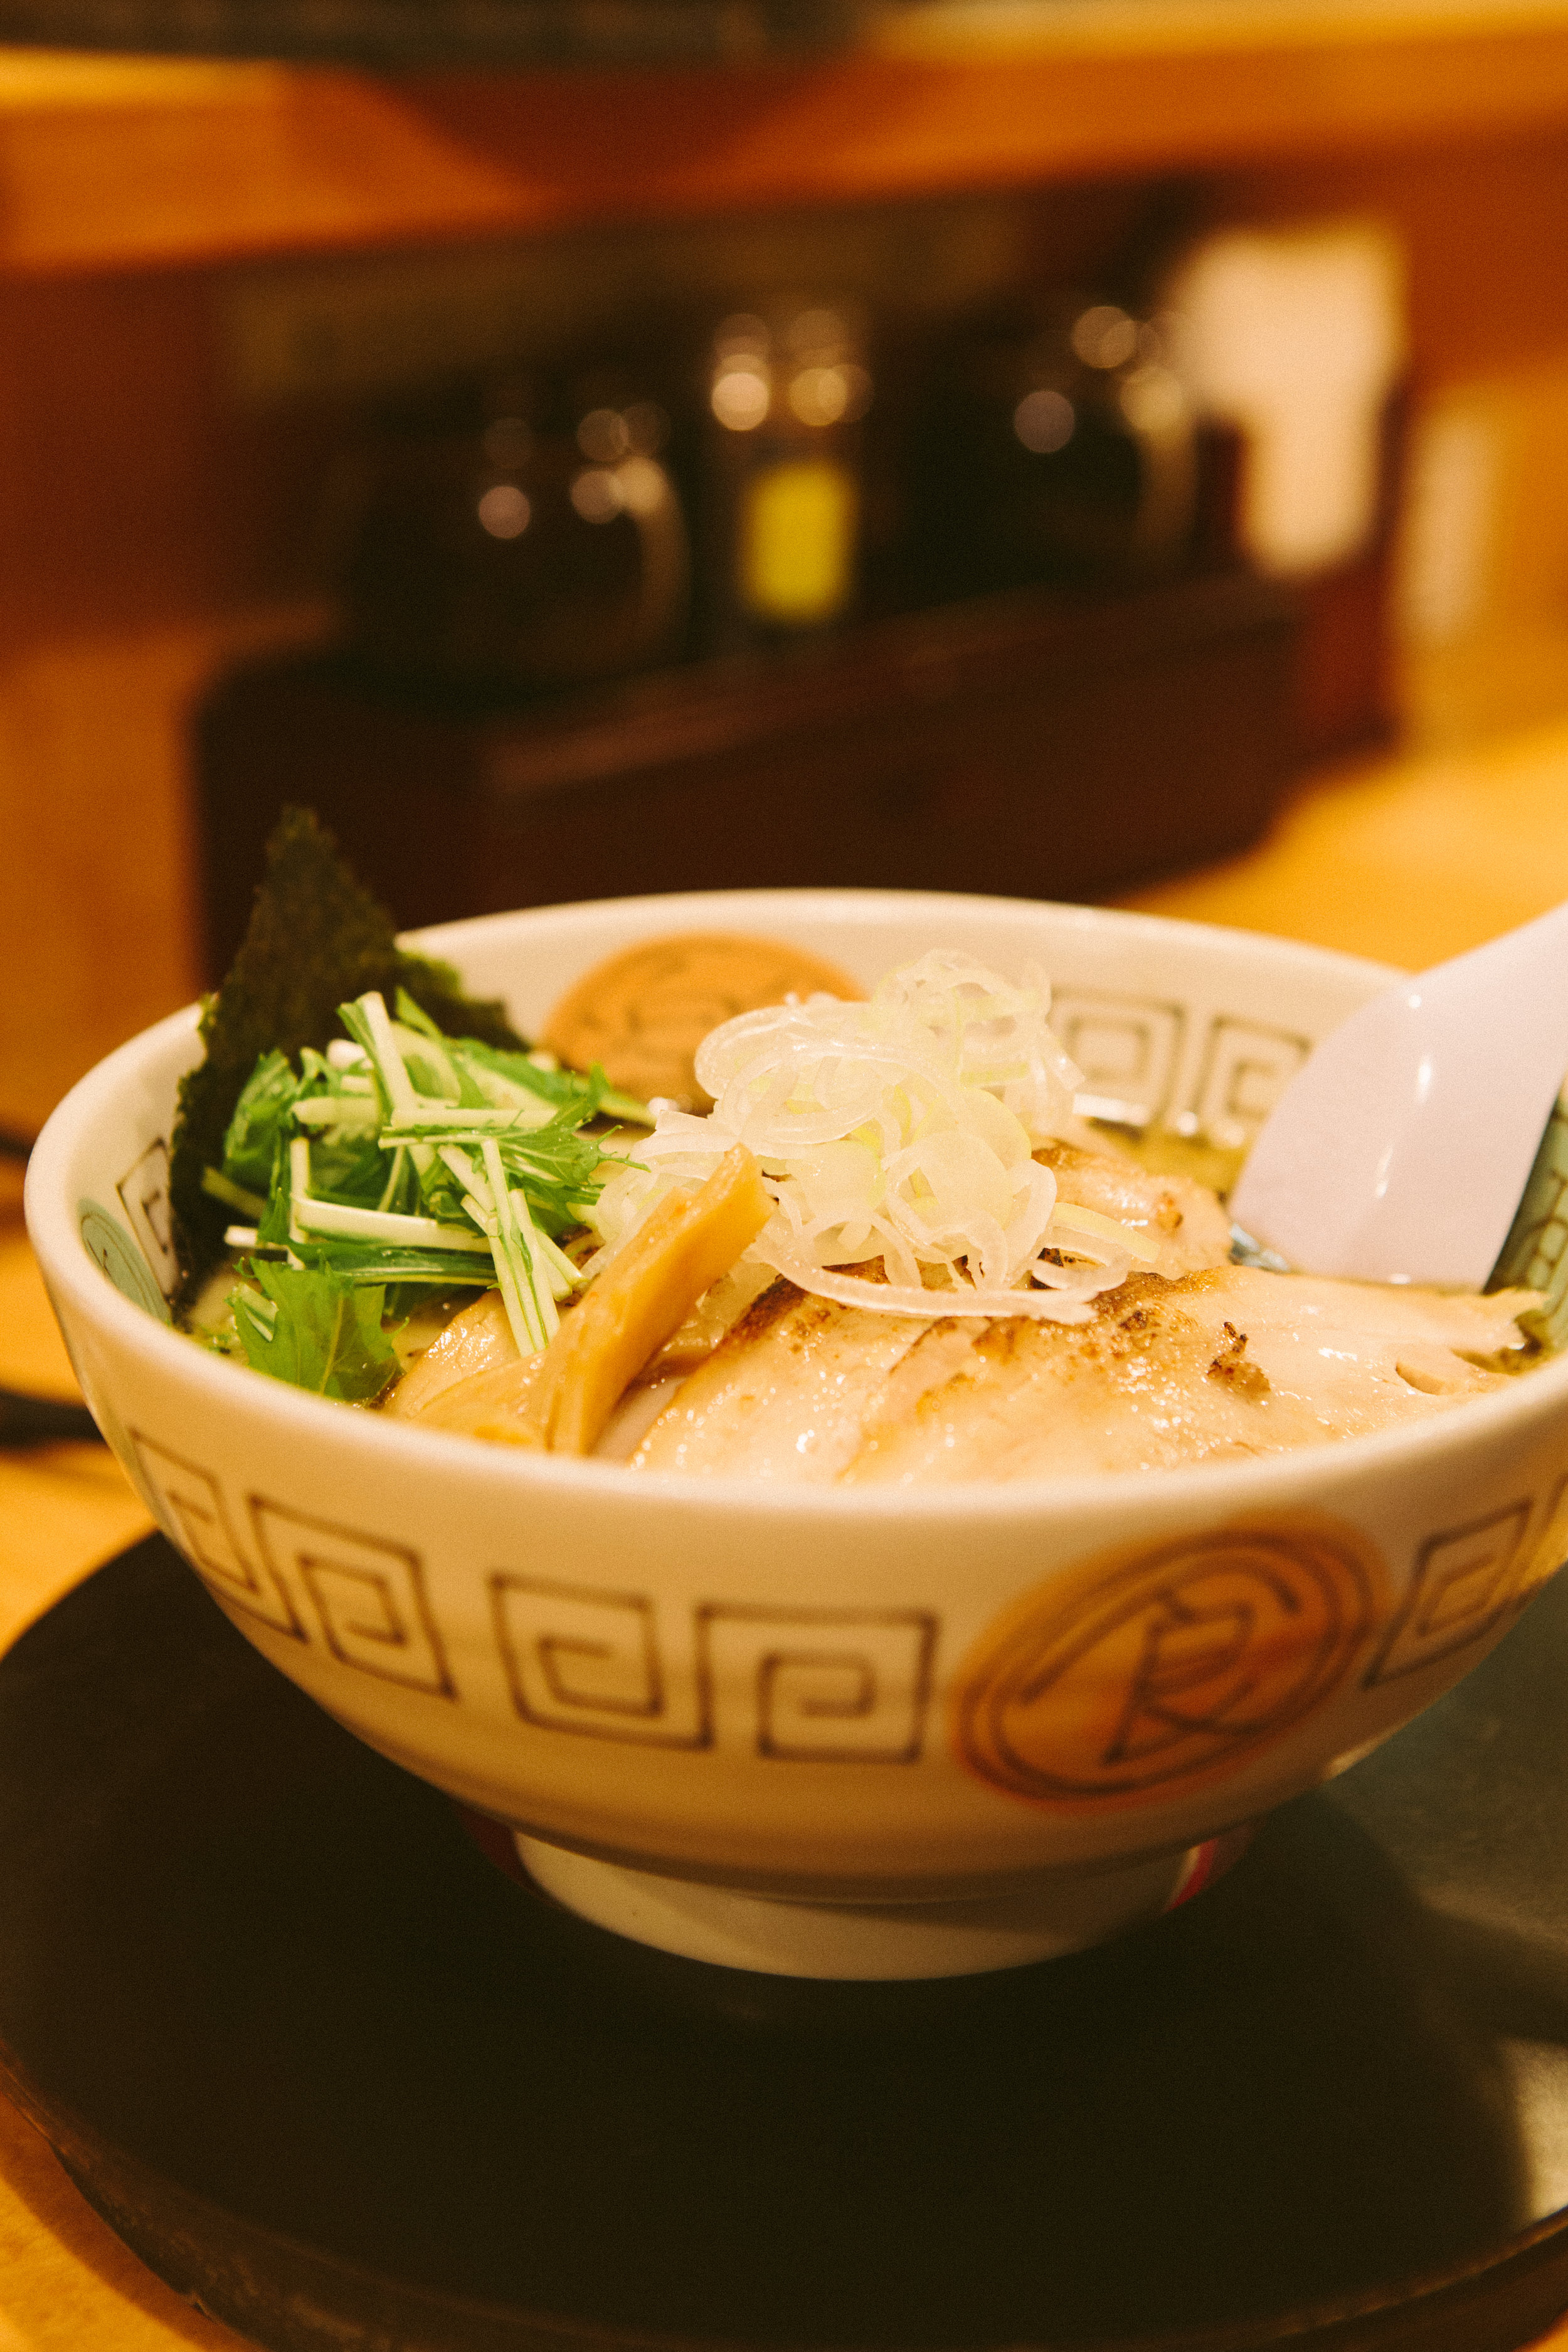 Tomiya - the first meal we had in Japan ever - turned out to be one of the best ramen we've ever had!    Japan, 〒160-0023 Tōkyō-to, Shinjuku-ku, Nishishinjuku, 1 Chome−19  −2